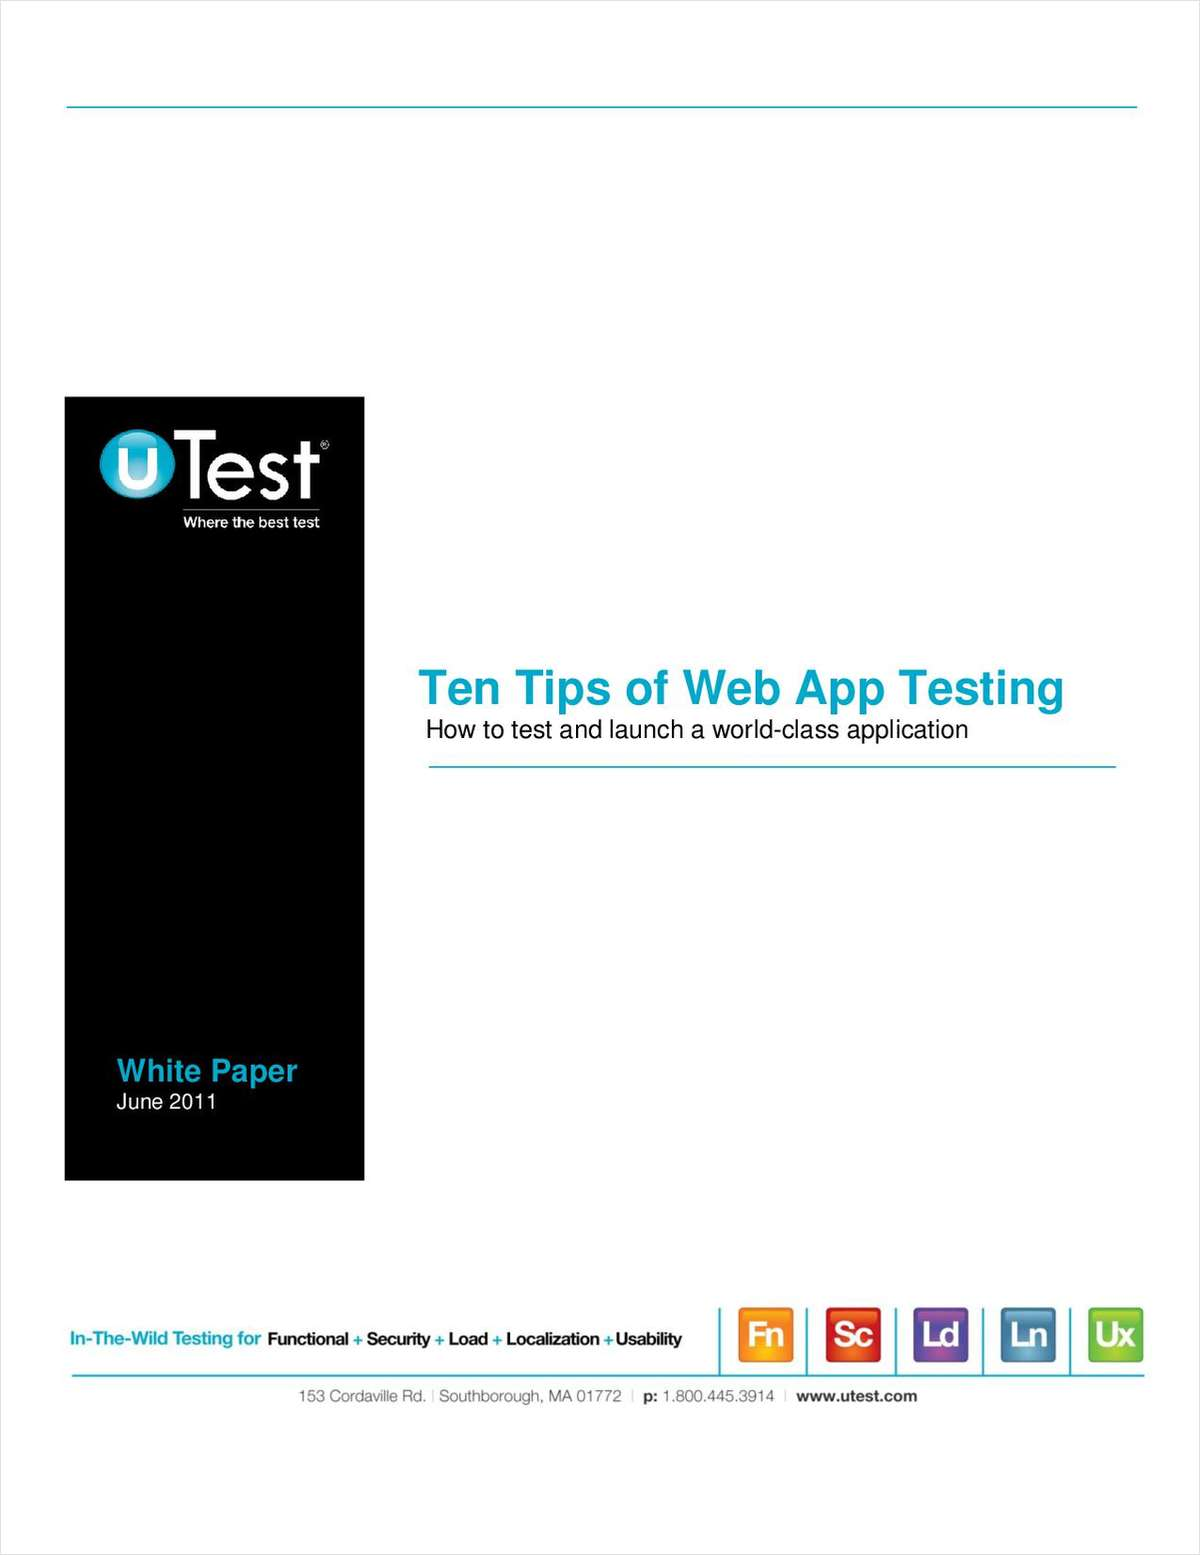 10 Tips of Web App Testing